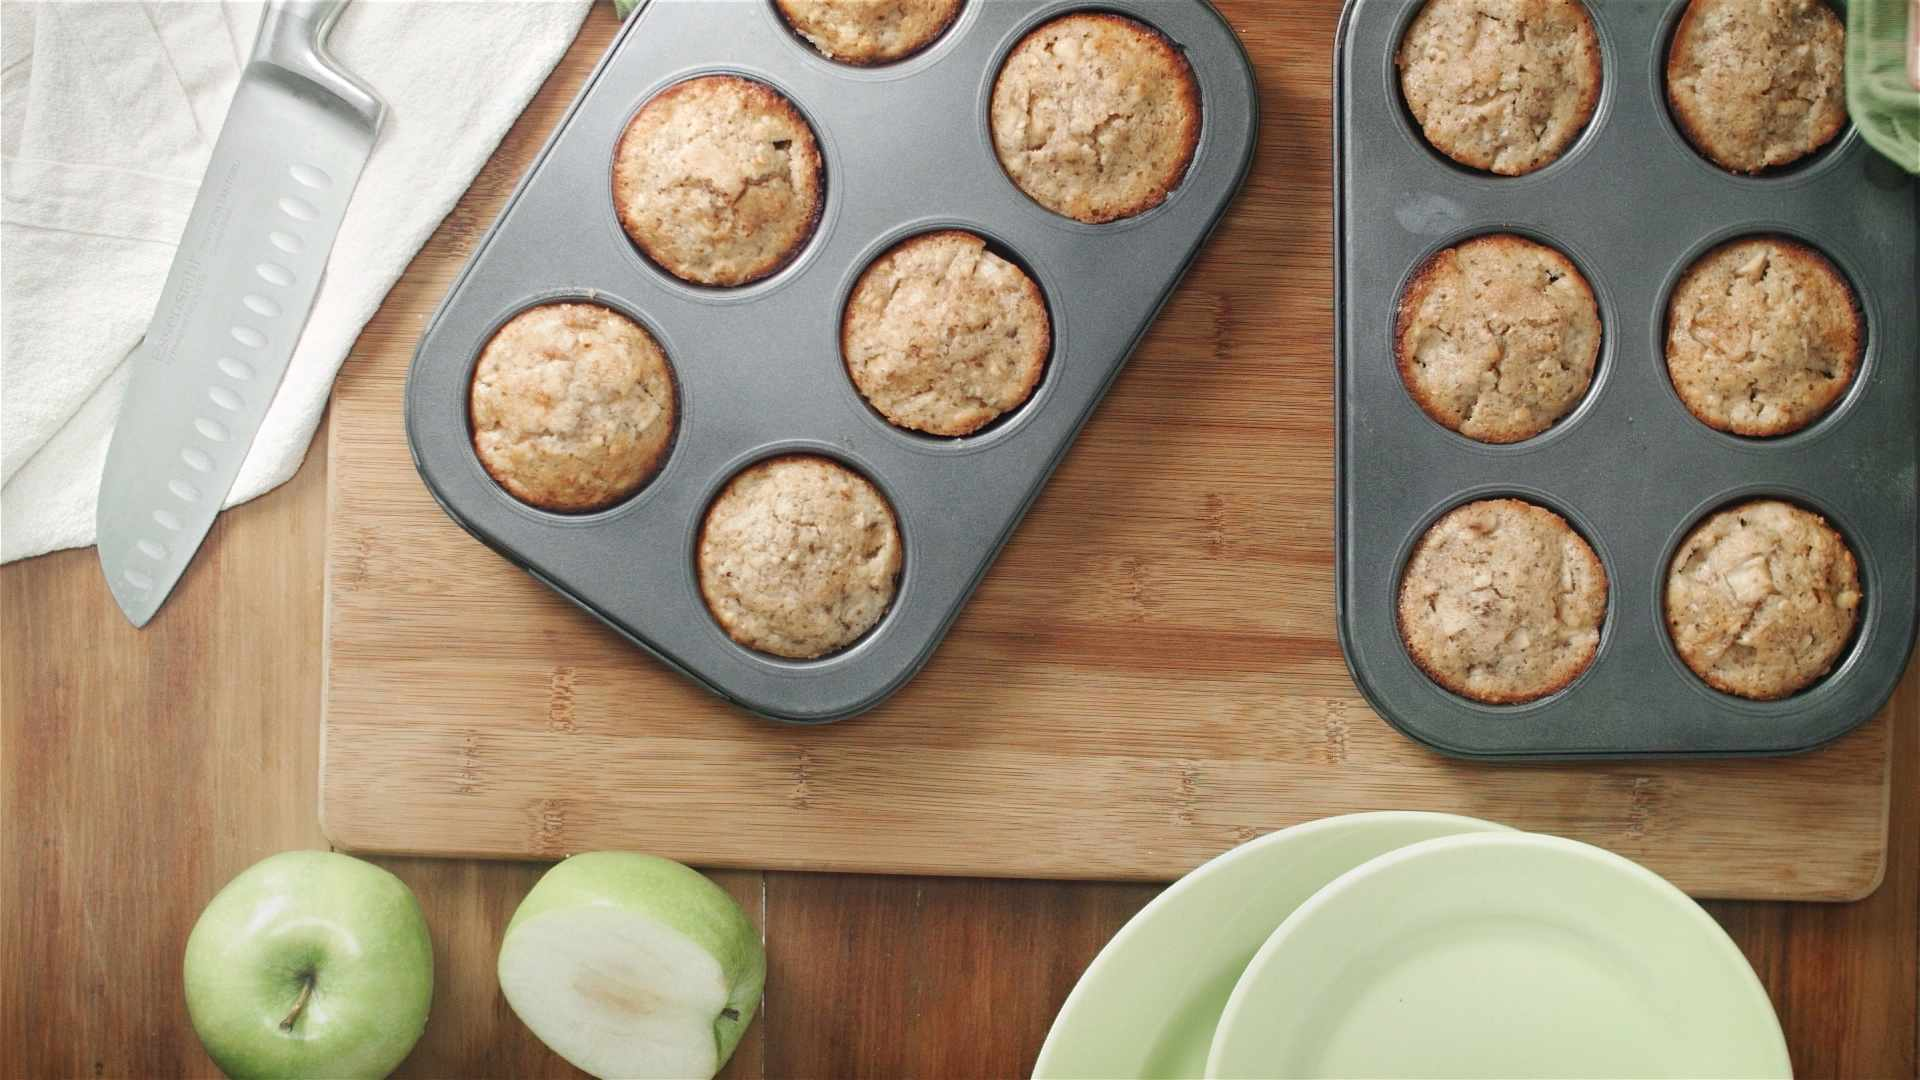 apple cinnamon muffin1-16-x-9